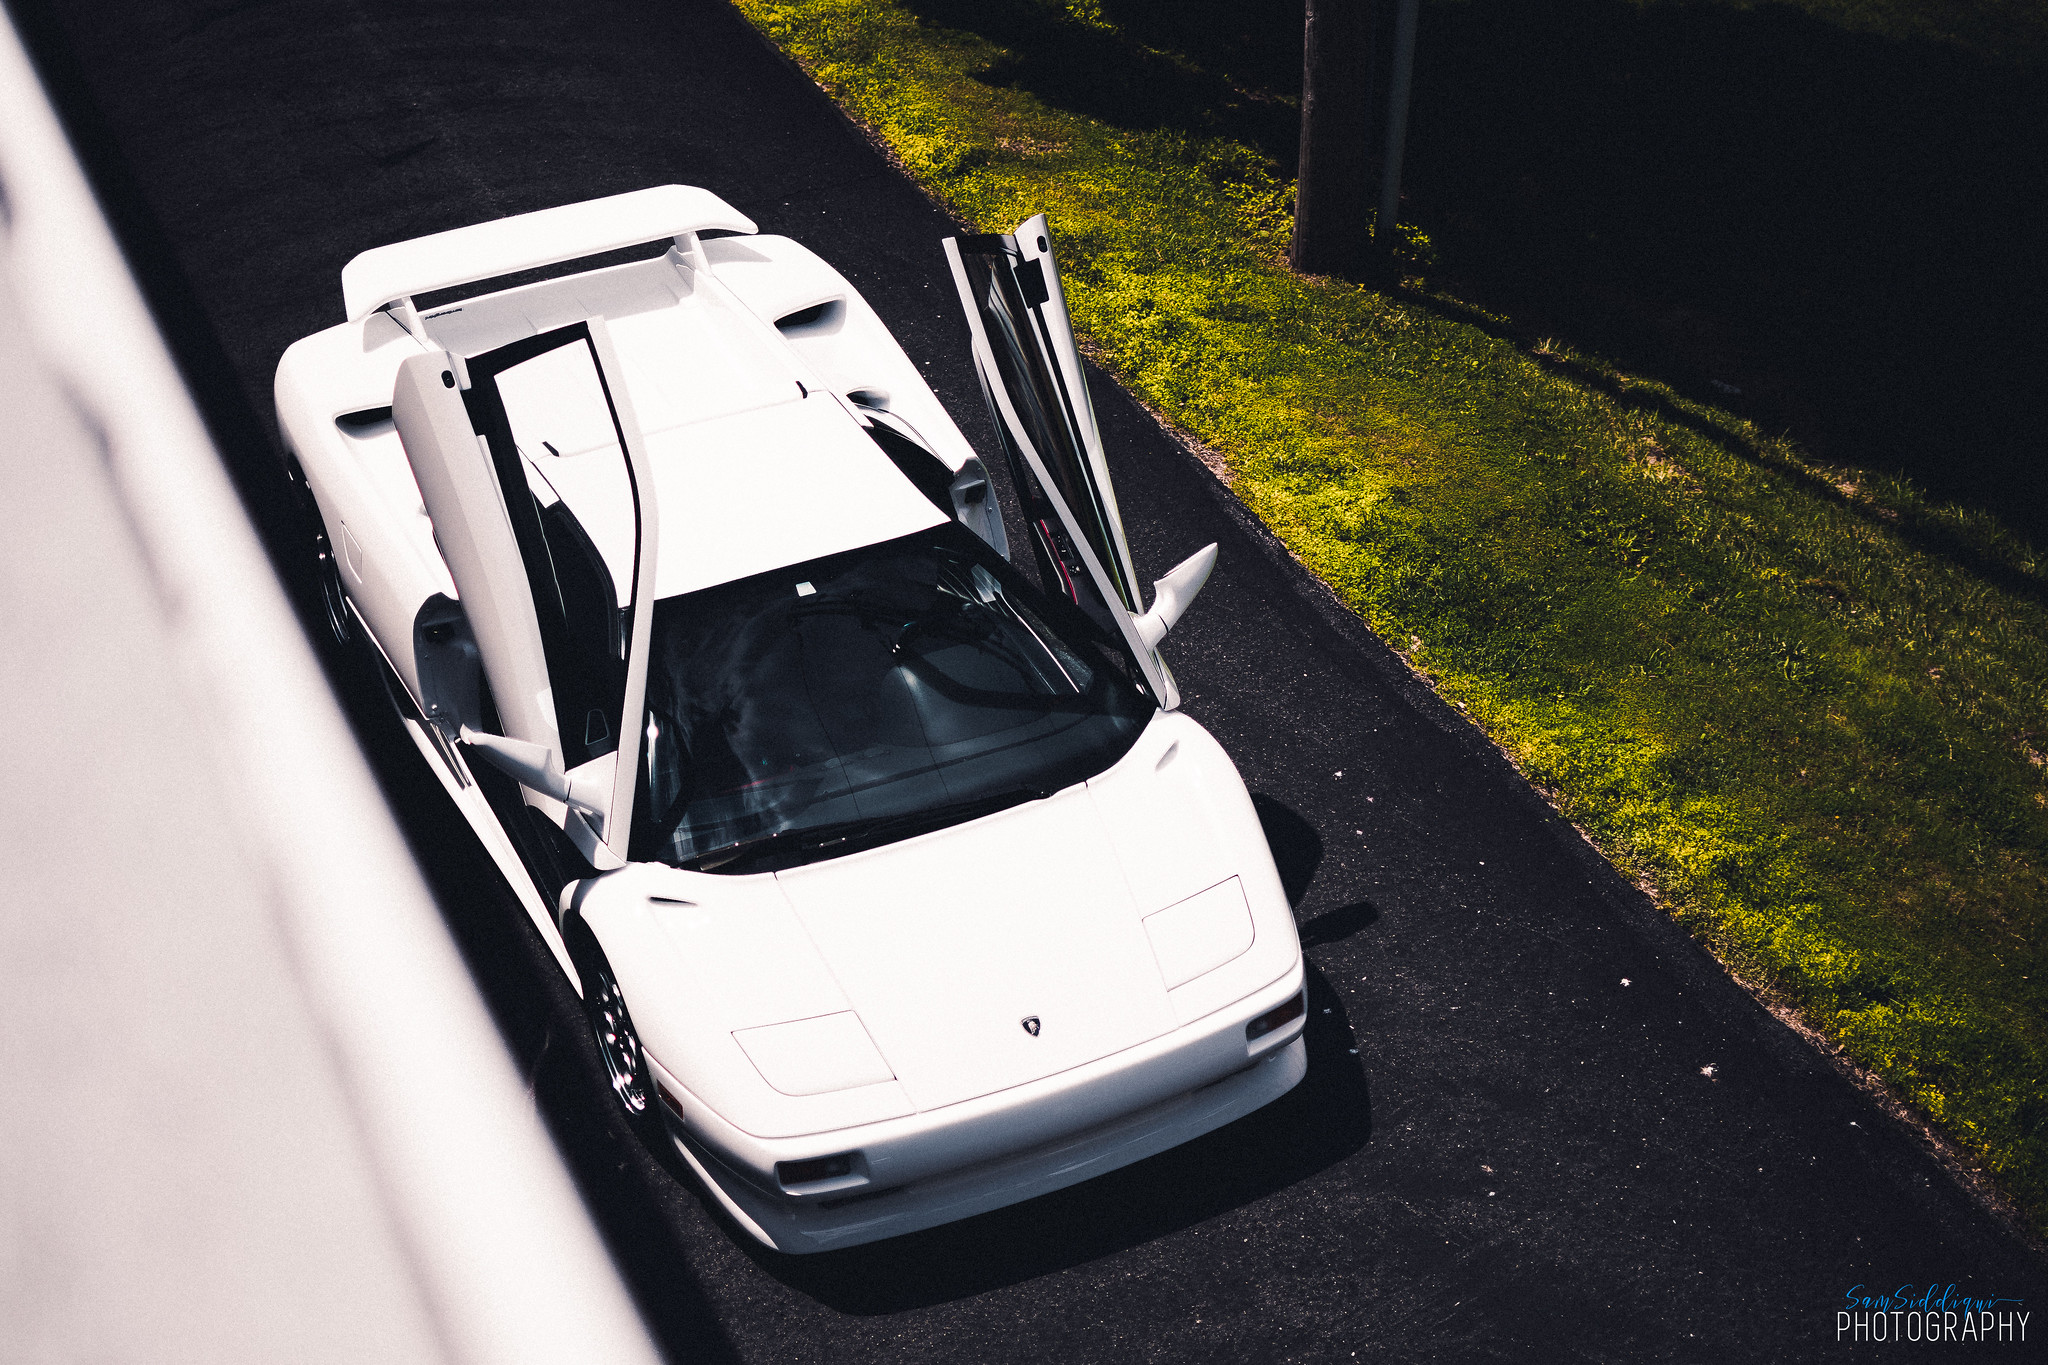 1991 White Lamborghini Diablo open doors